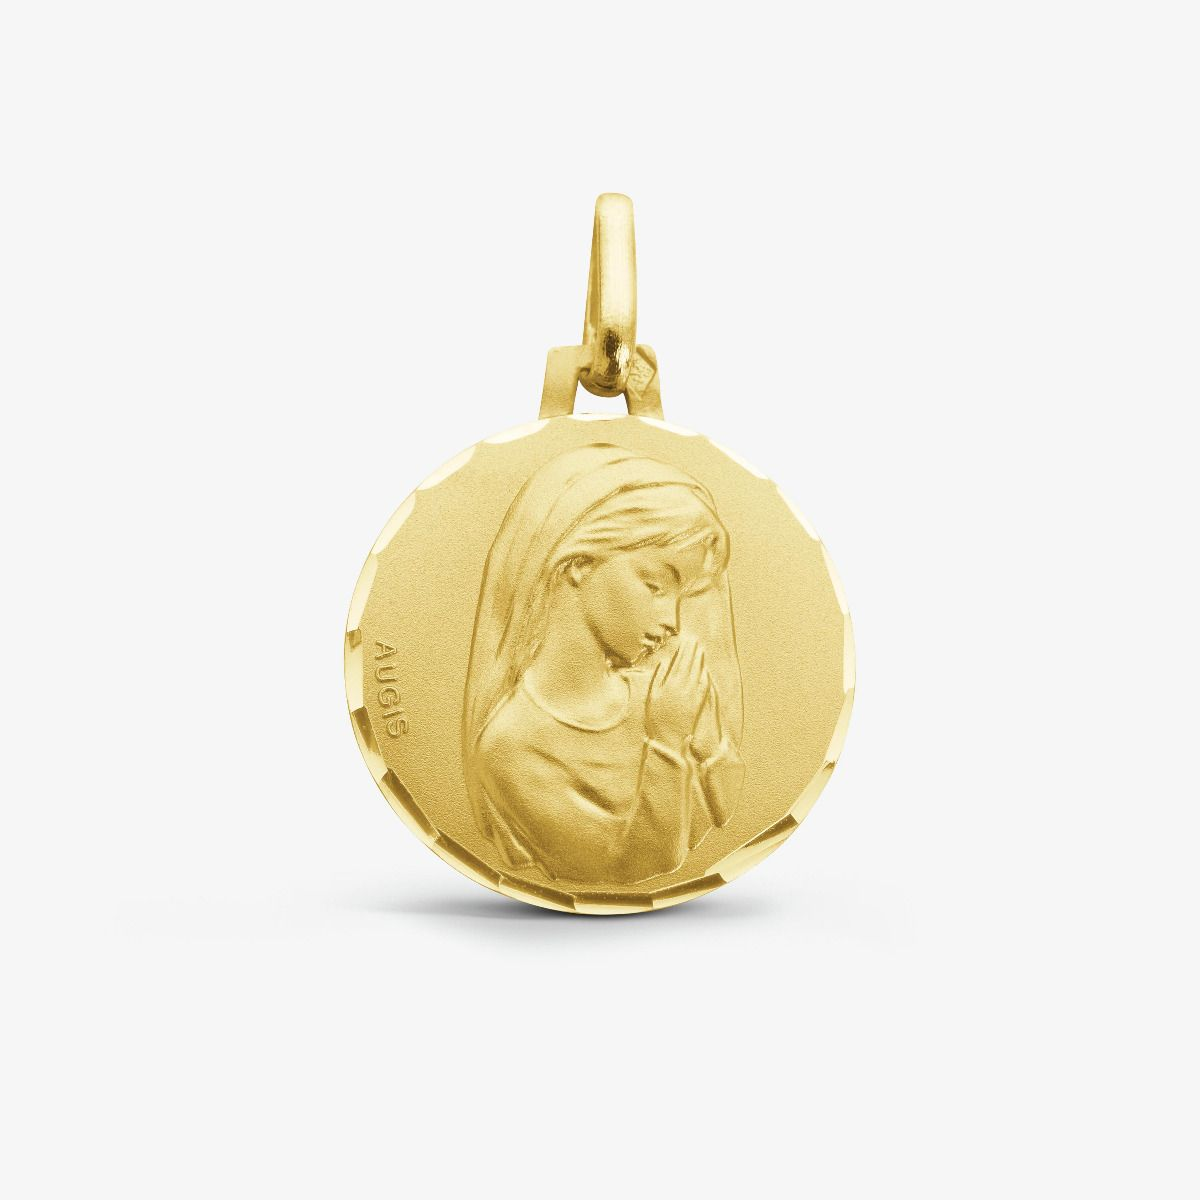 Médaille Vierge Jeune mains jointes Or Jaune 18 carats -16 mm